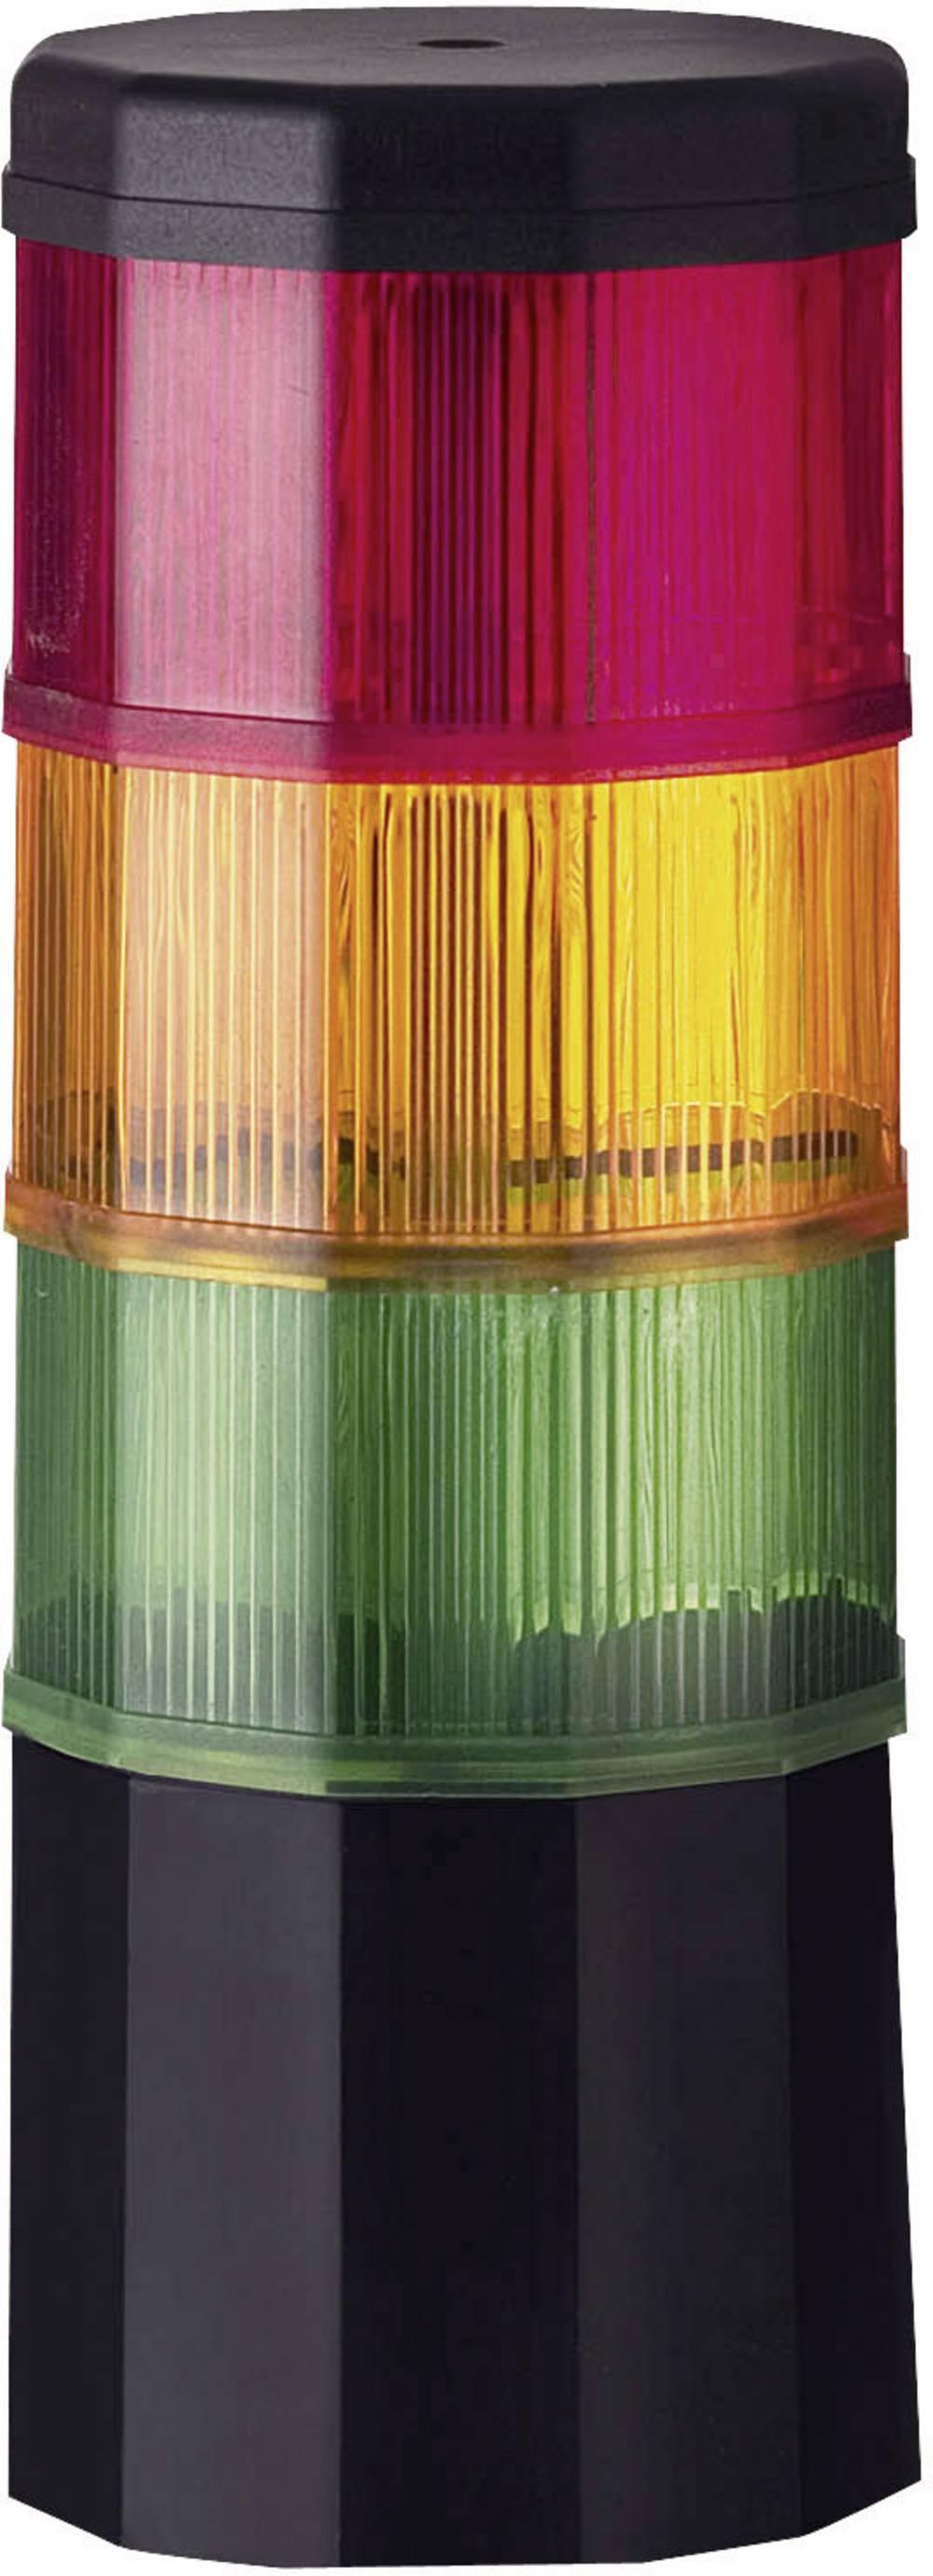 Werma Fernost 969.009.75 LED-Signal. steber CST 60 rdeča/rumena/zelena, 24 V DC/AC, 90 mA